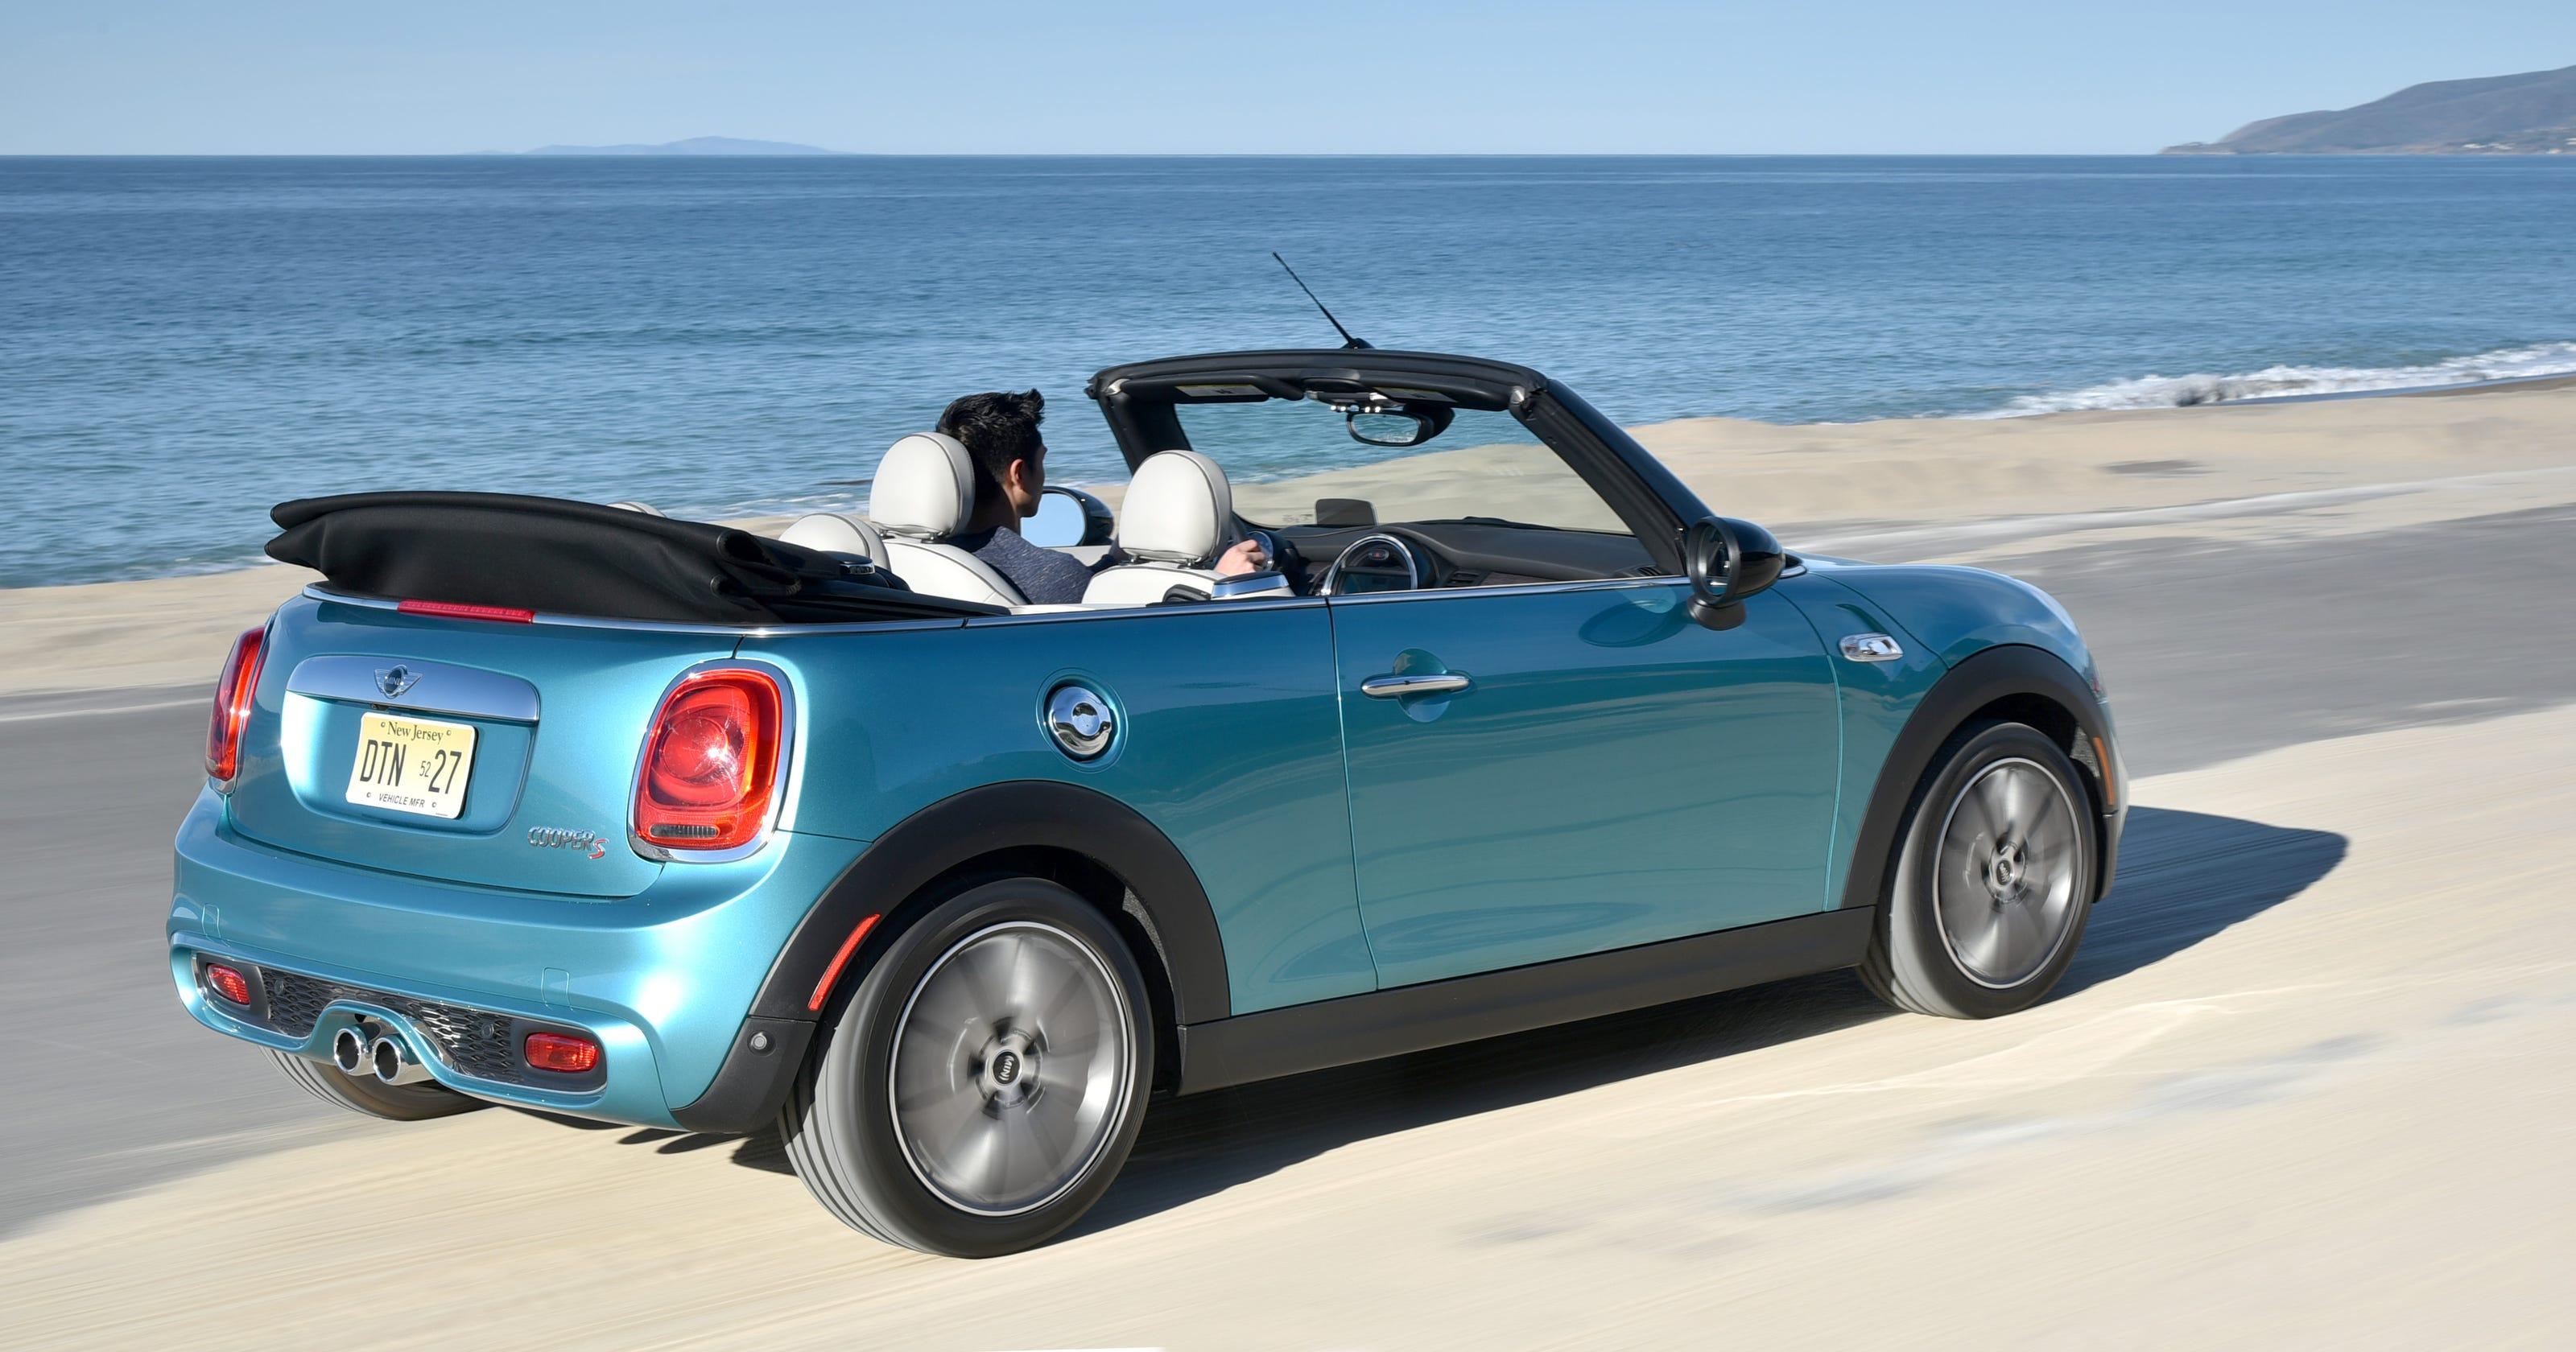 Review: Mini Cooper convertible is pure fun